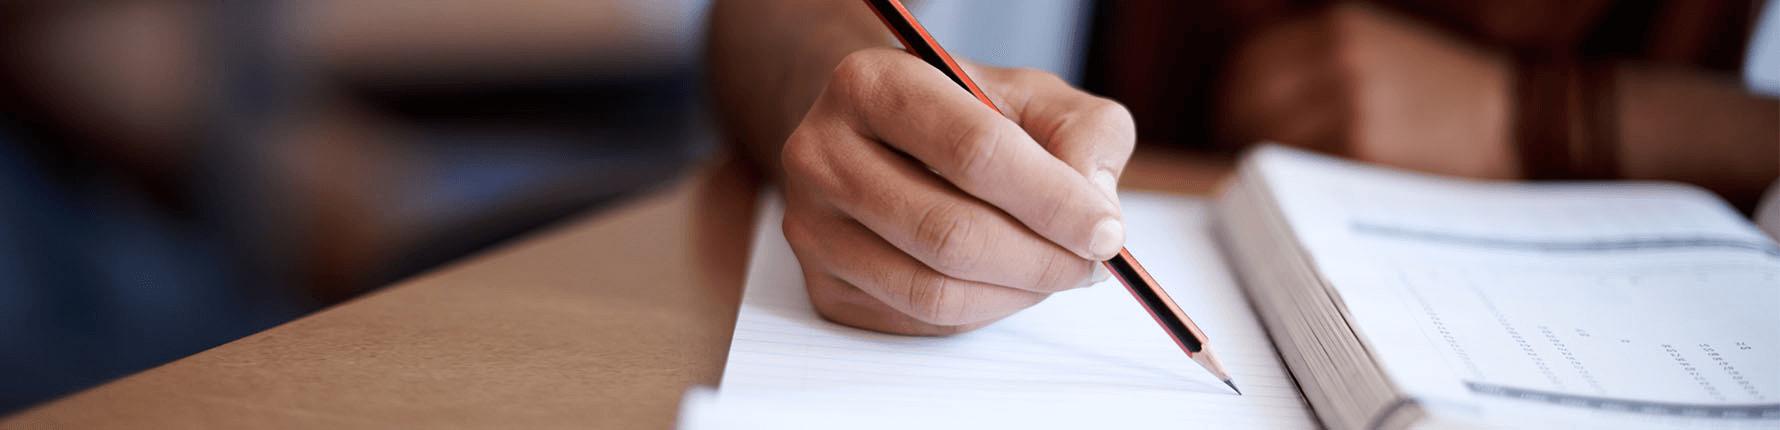 Civil Service Exam Process | NYC Health + Hospitals